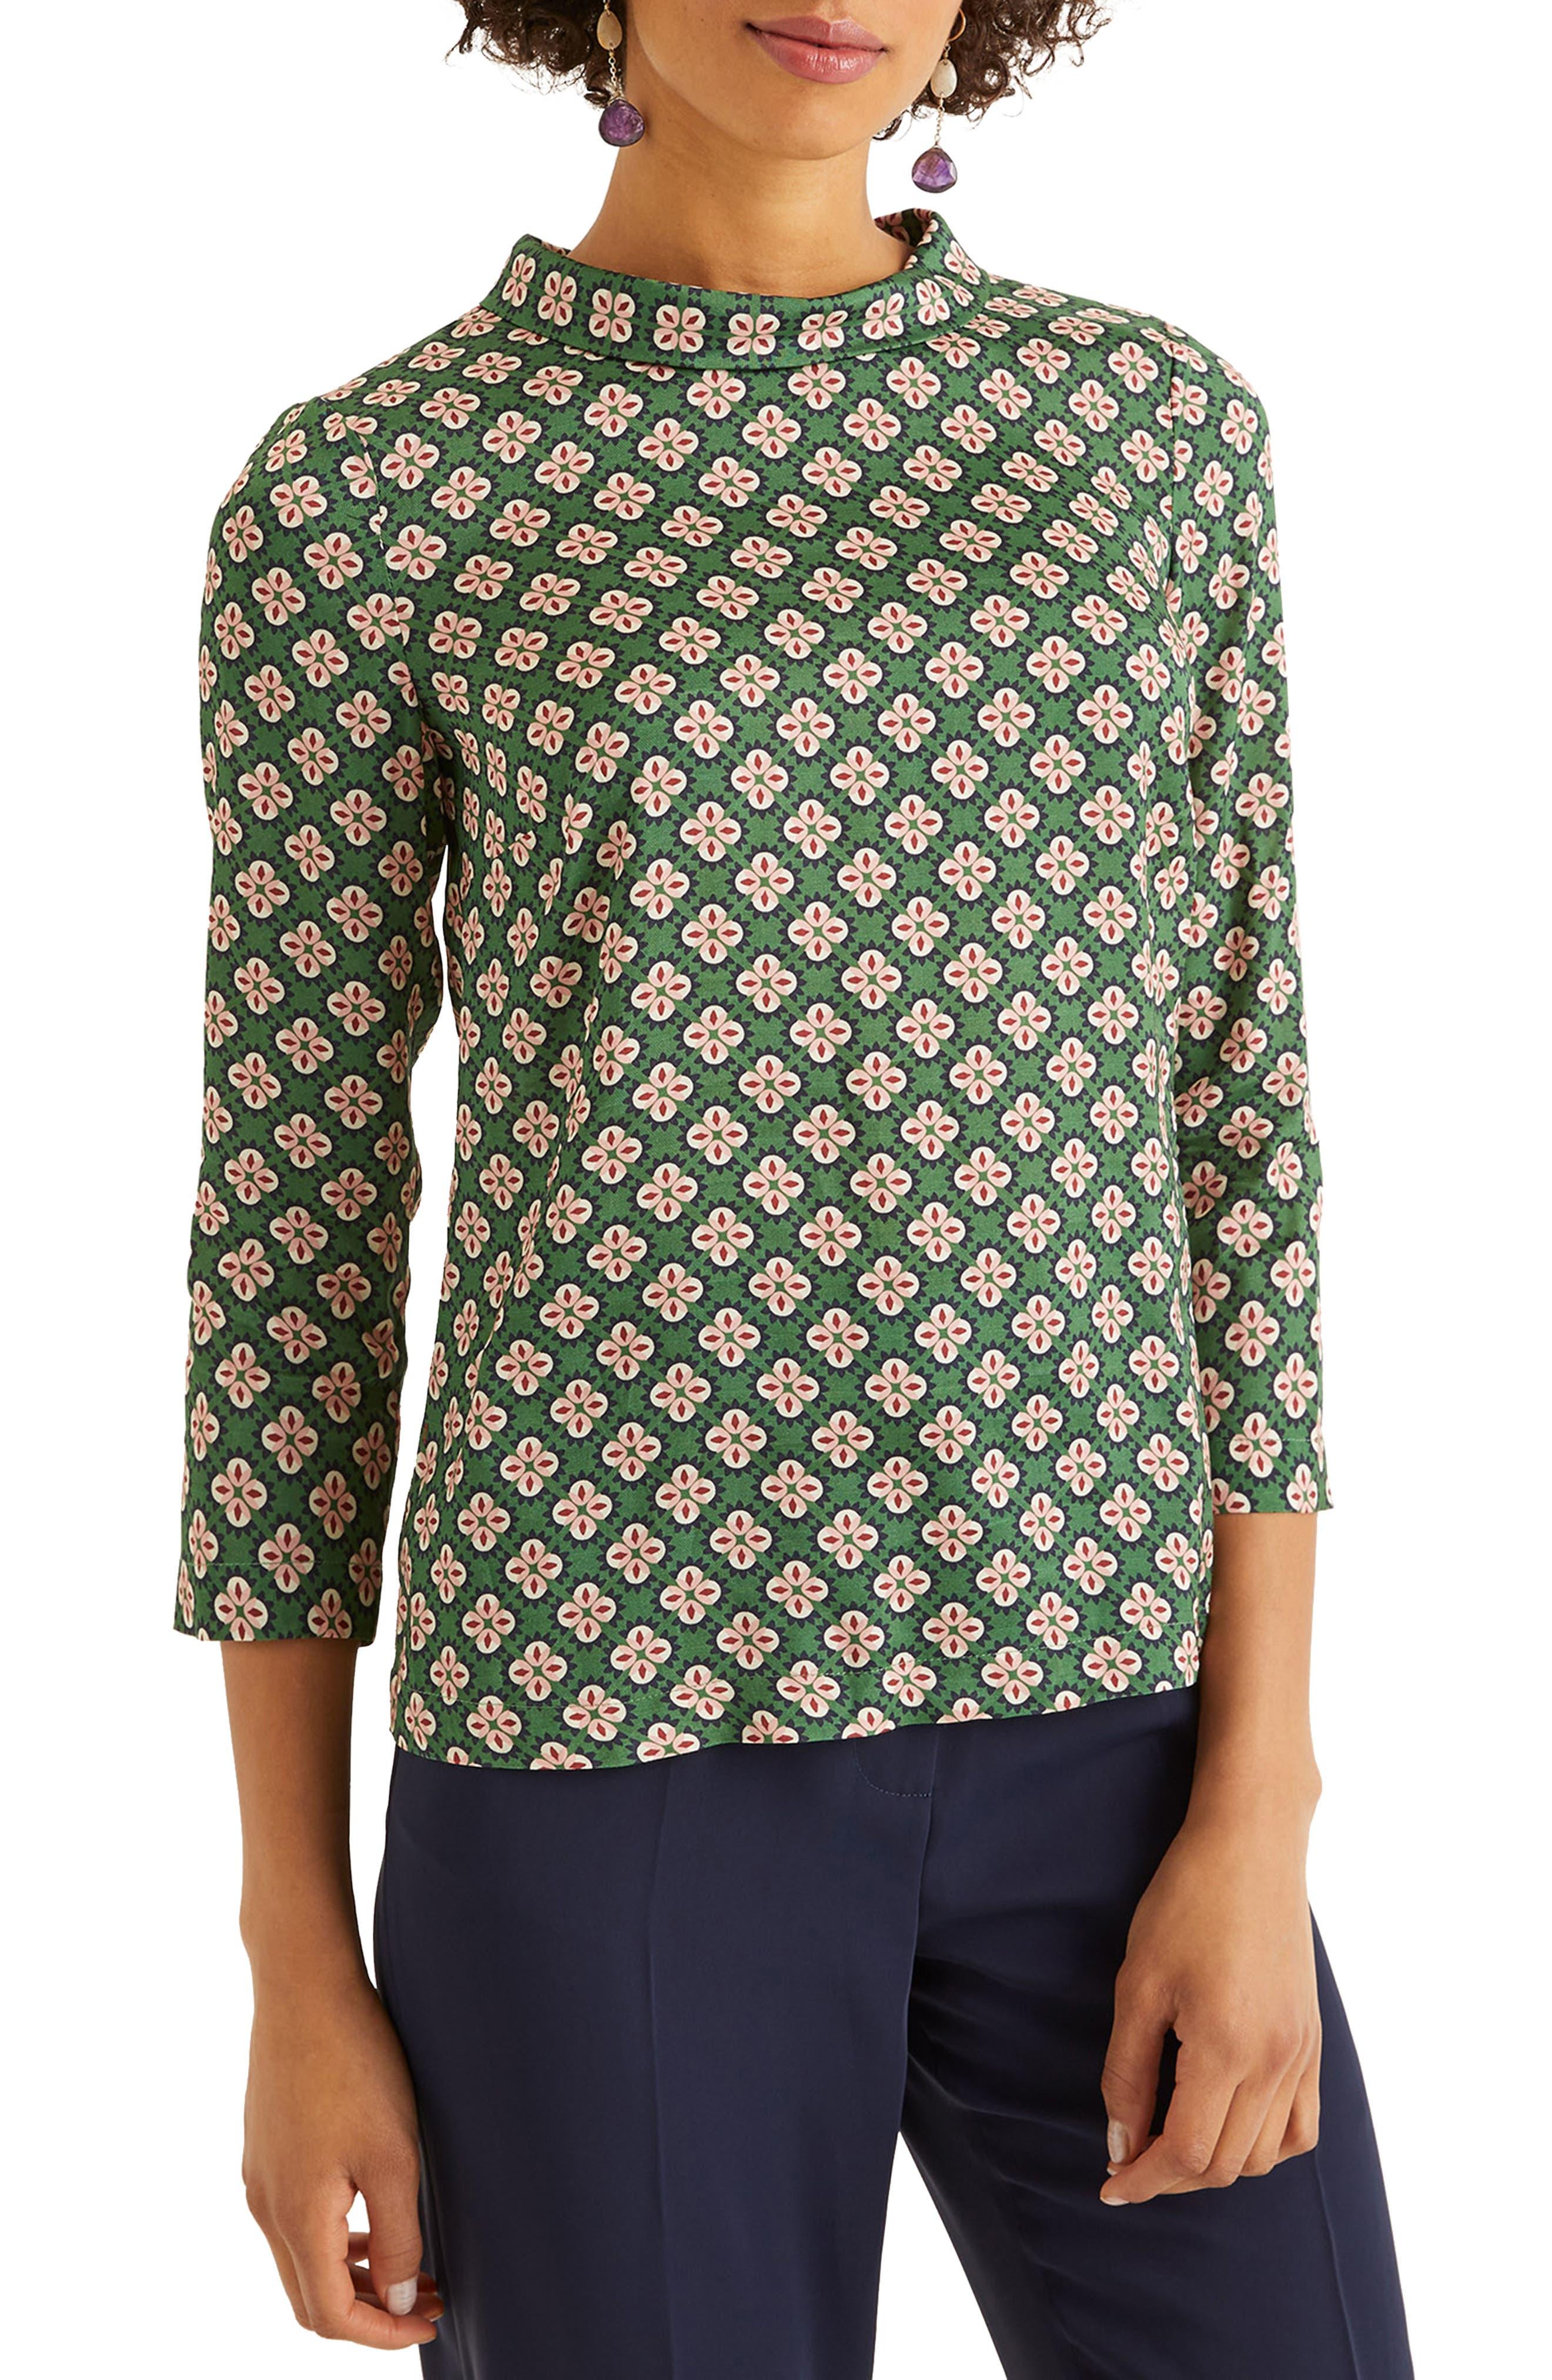 60s Shirts, T-shirt, Blouses, Hippie Shirts Womens Boden Lily Medallion Print Top $90.00 AT vintagedancer.com